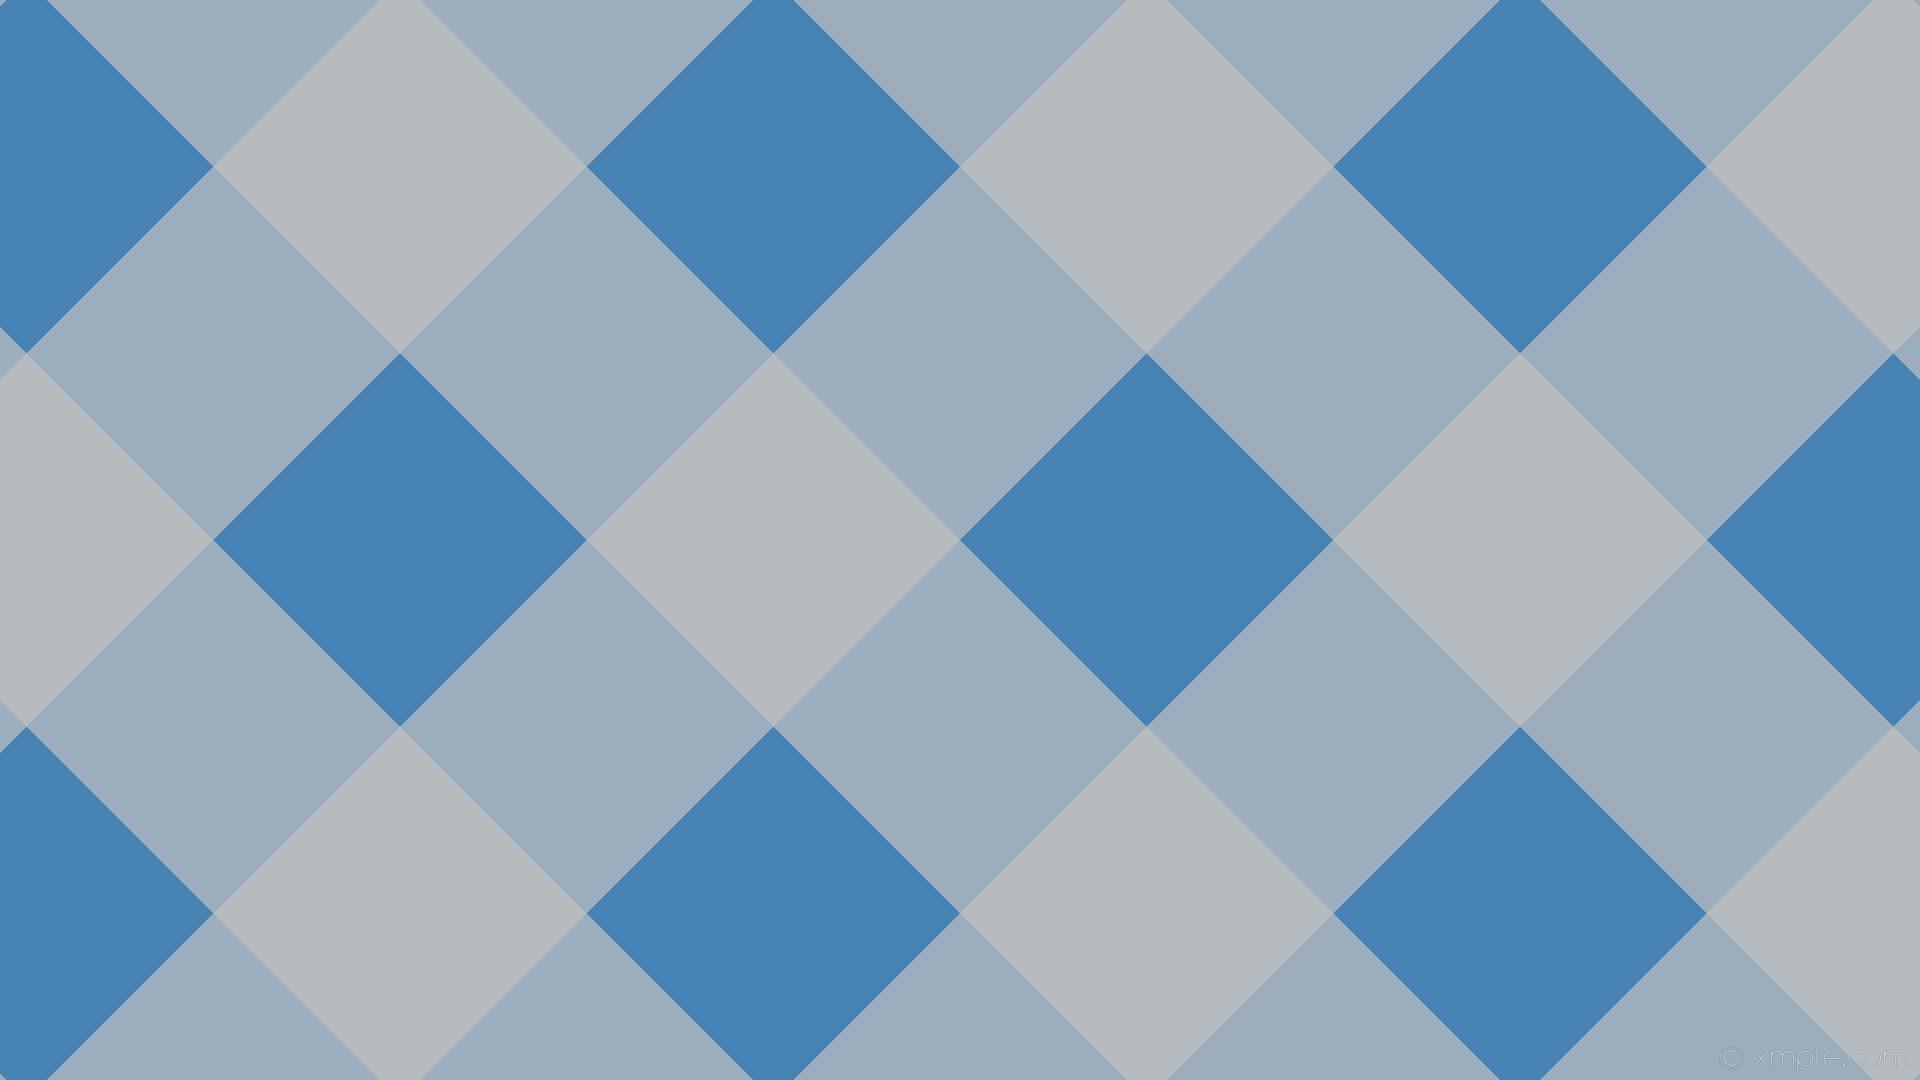 wallpaper striped grey checker gingham blue steel blue silver #4682b4  #c0c0c0 225° 264px